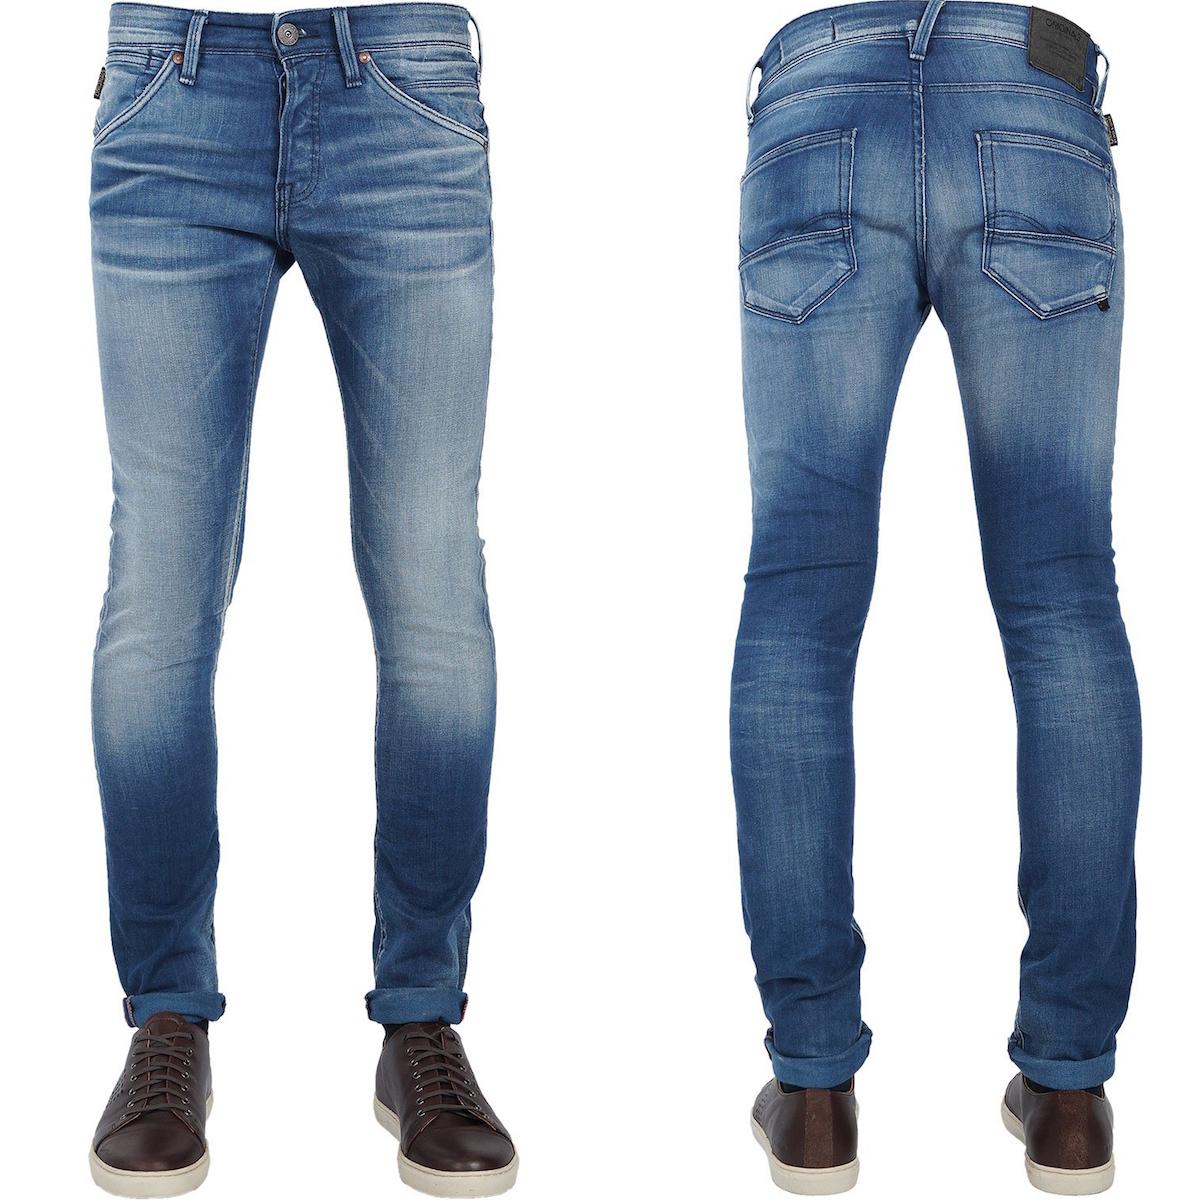 ny produkt Perfekt kvalite söt Jack & Jones Men's Slim Fit Stretch Jeans Trousers Glenn Bl 408 | eBay